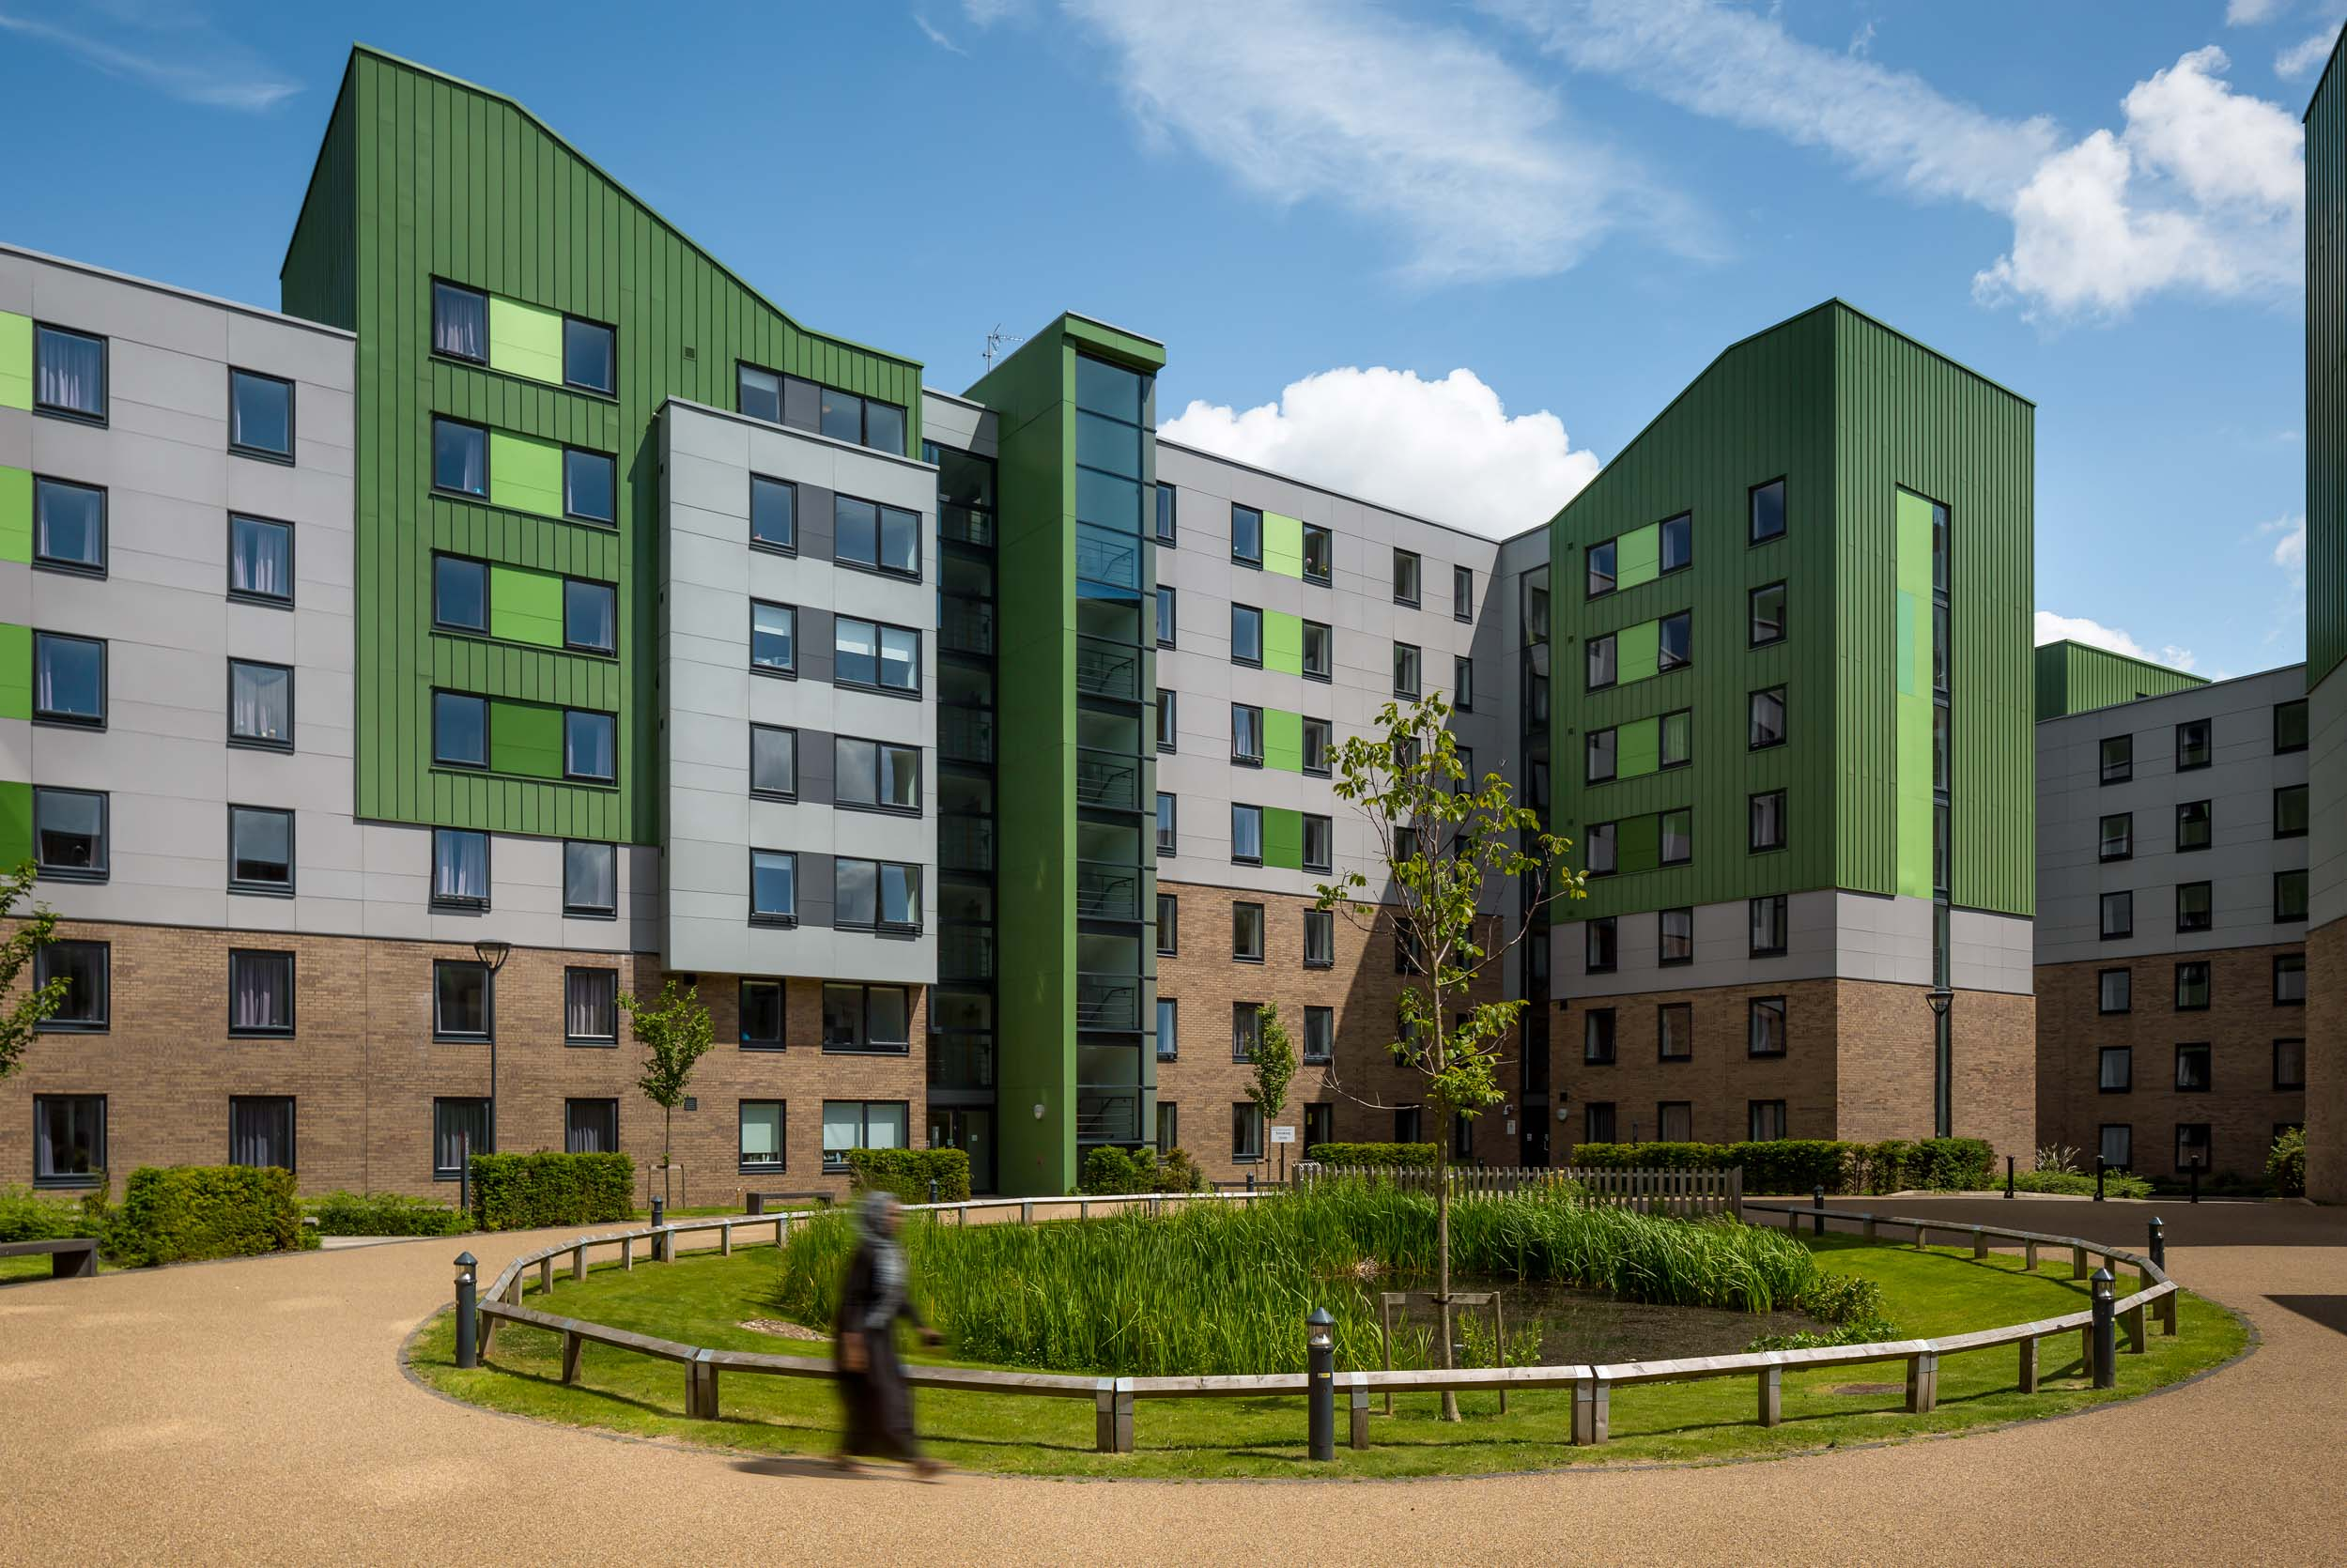 the green bradford university student flats architectural exterior.jpg